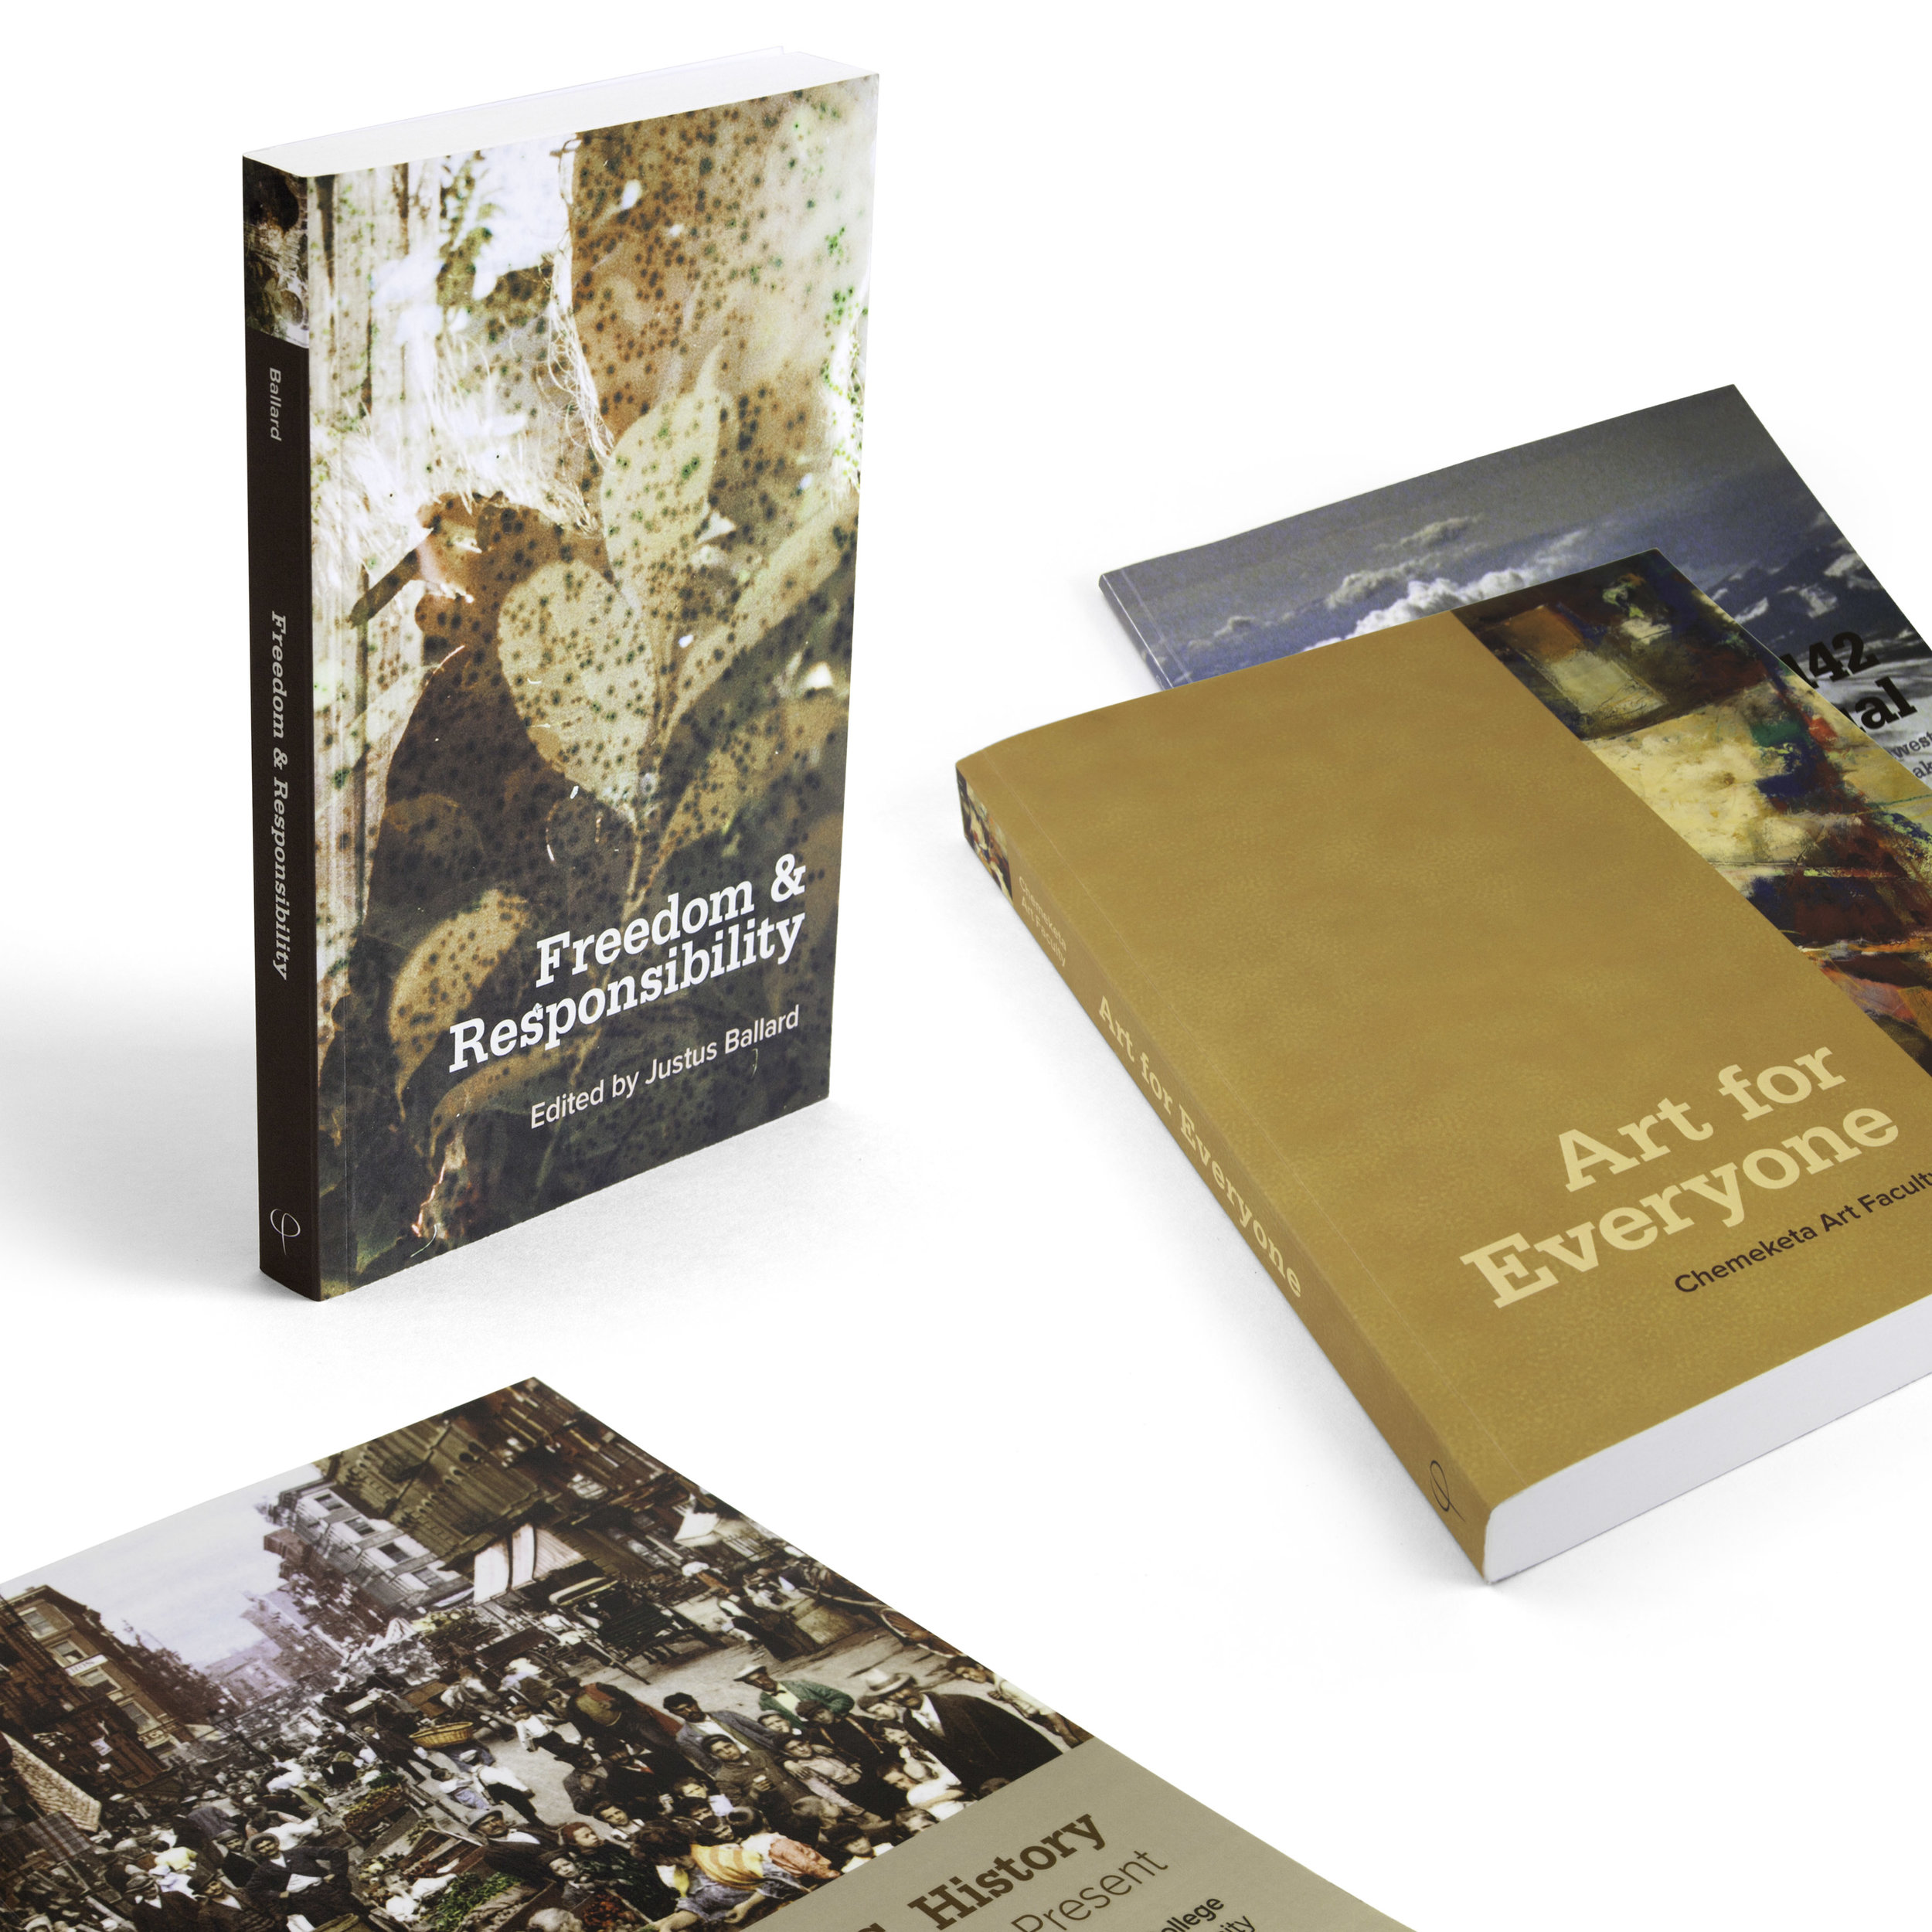 cp book covers.jpg